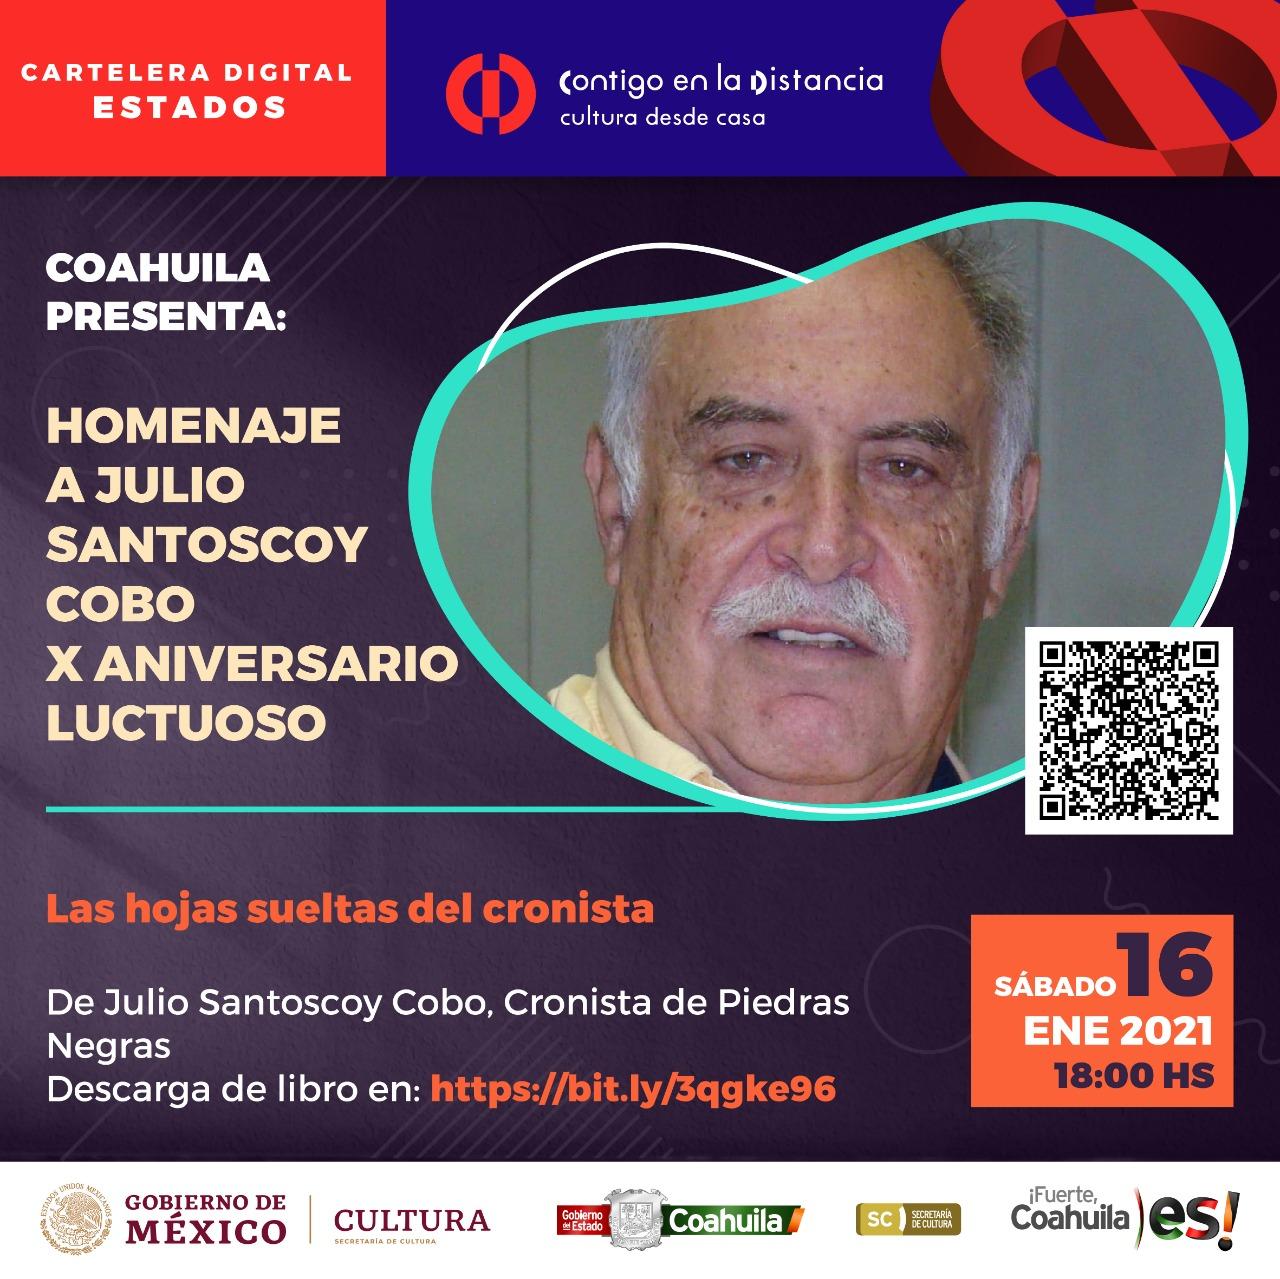 COAHUILA PRESENTA: HOMENAJE A JULIO SANTOSCOY COBO, X ANIVERSARIO LUCTUOSO